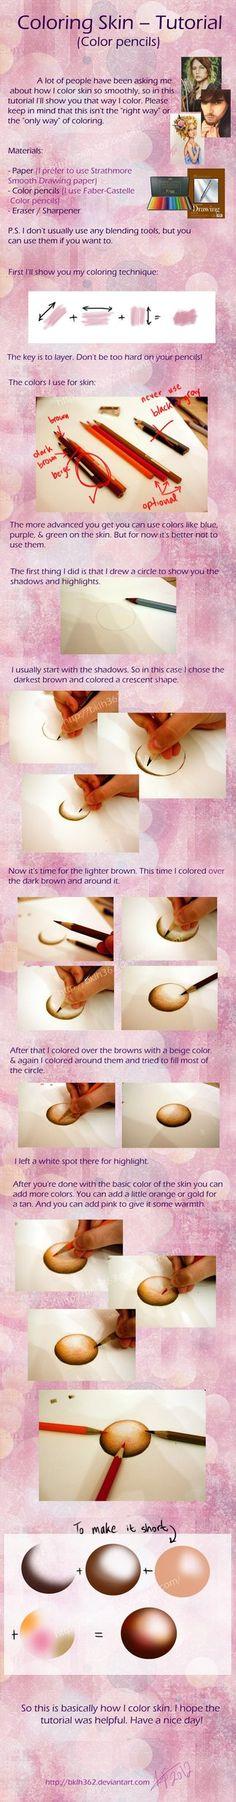 Coloring Skin (Color pencils tutorial) by *BKLH362 on deviantART